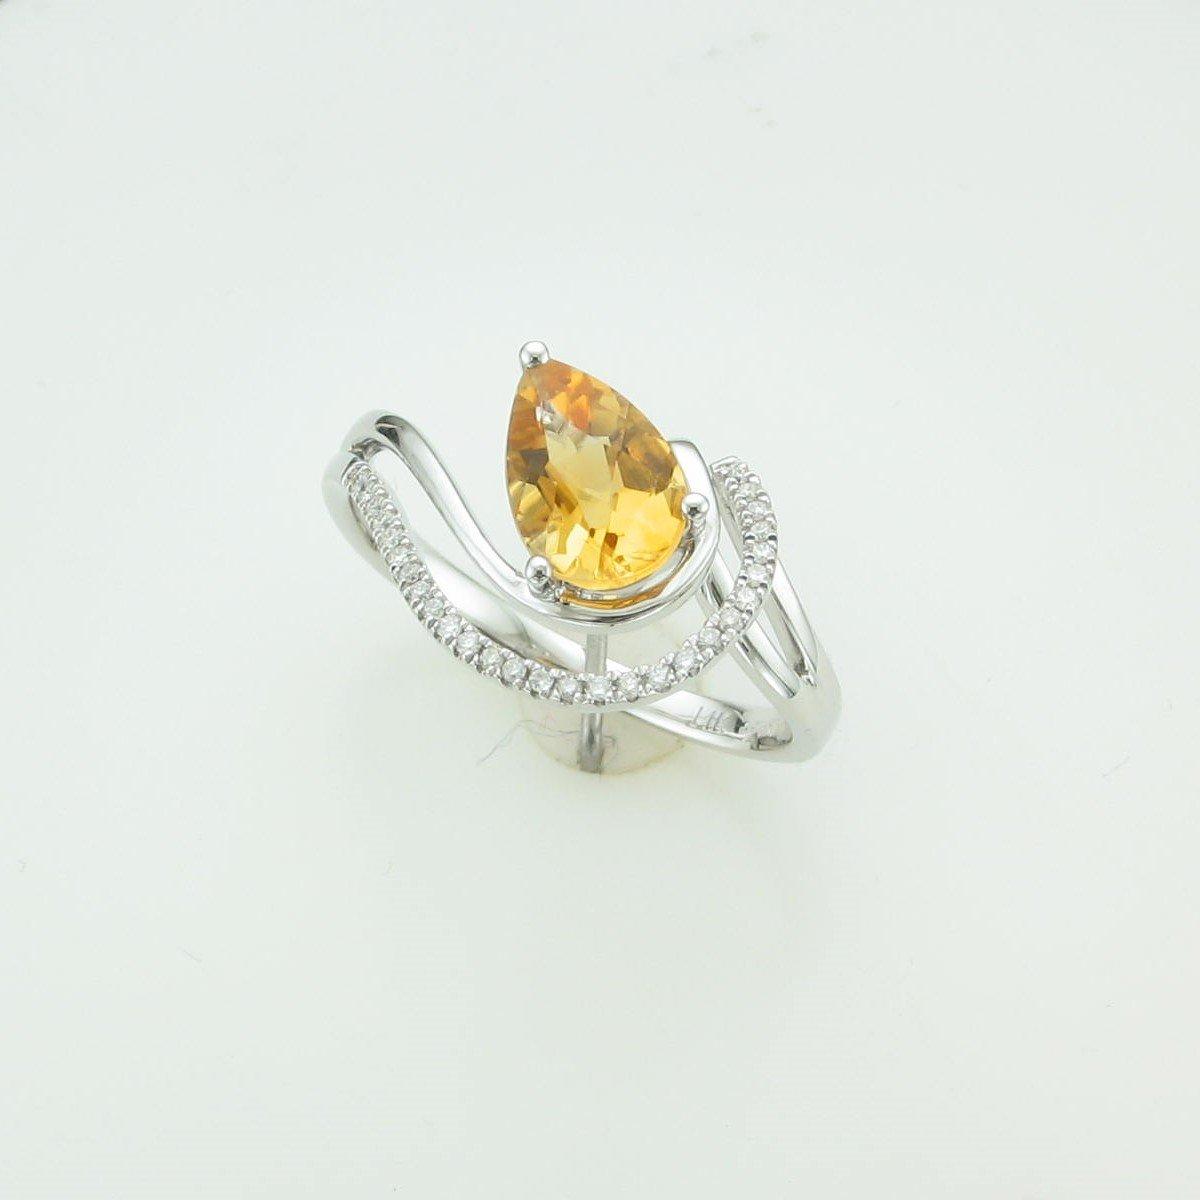 1.16ct Citrine and Diamond Ring set in 14k White Gold